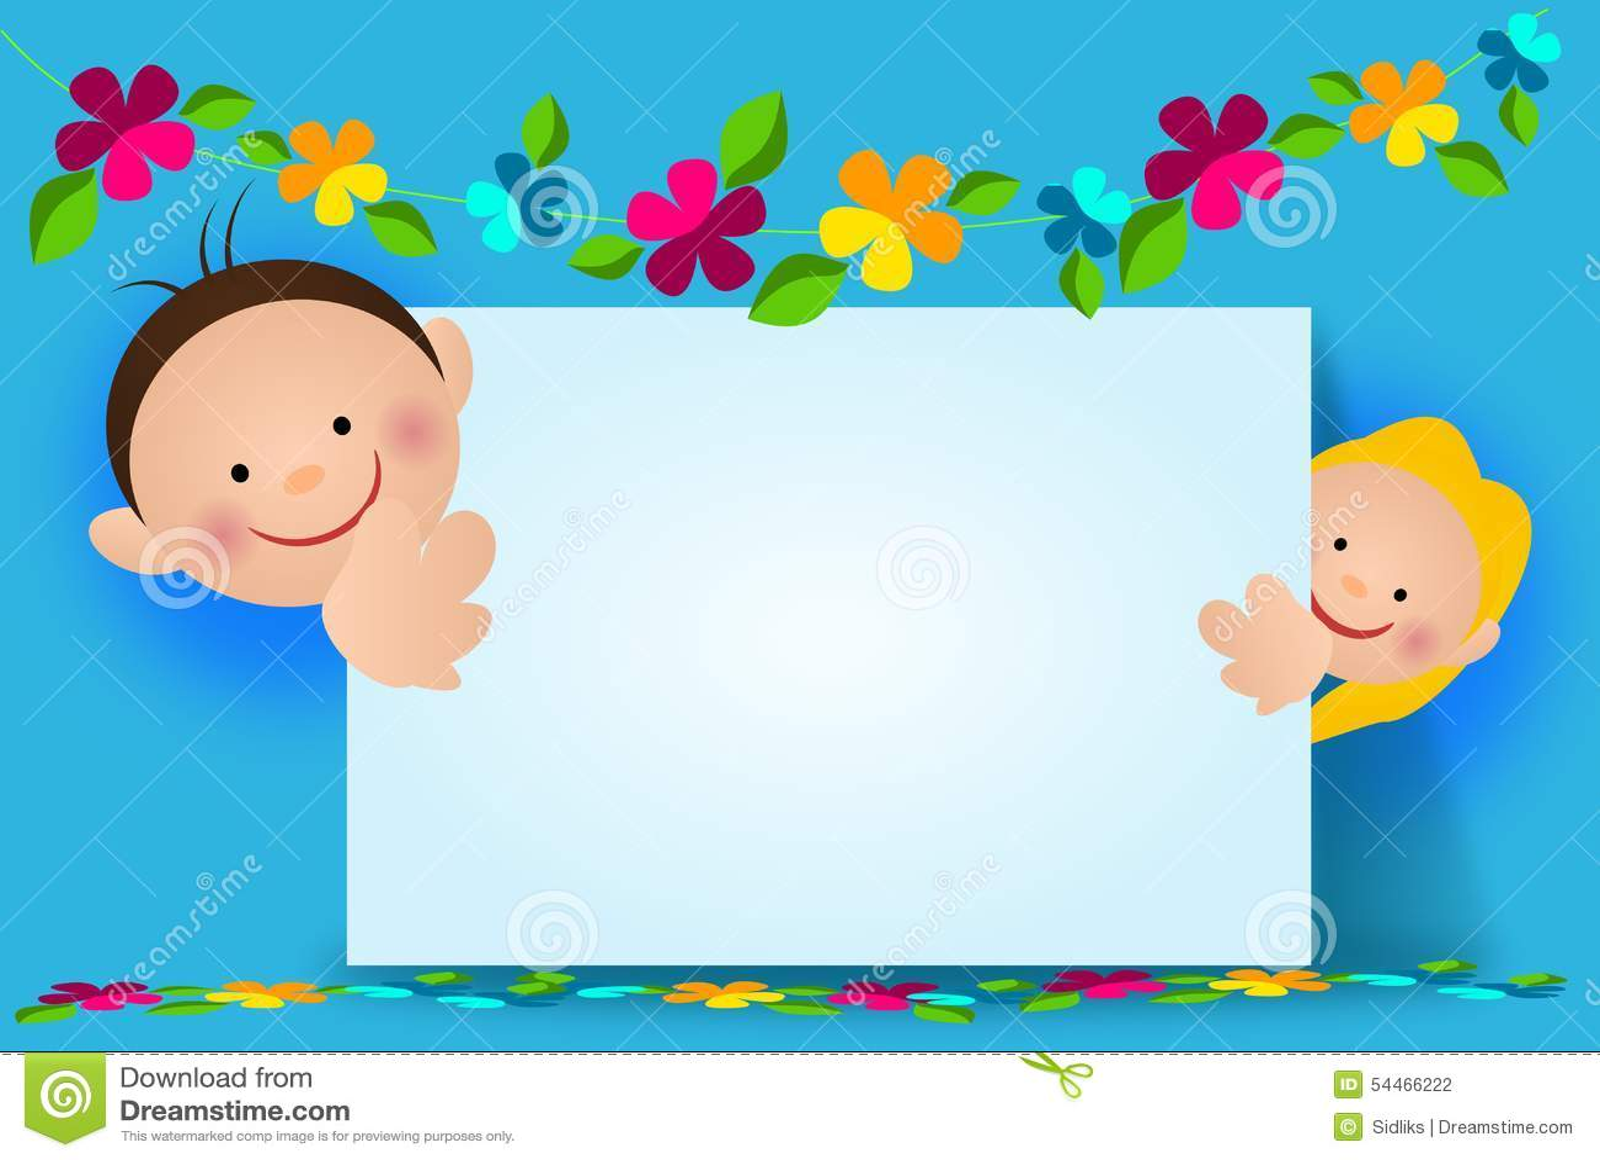 Happy children background stock illustration. Image of ...